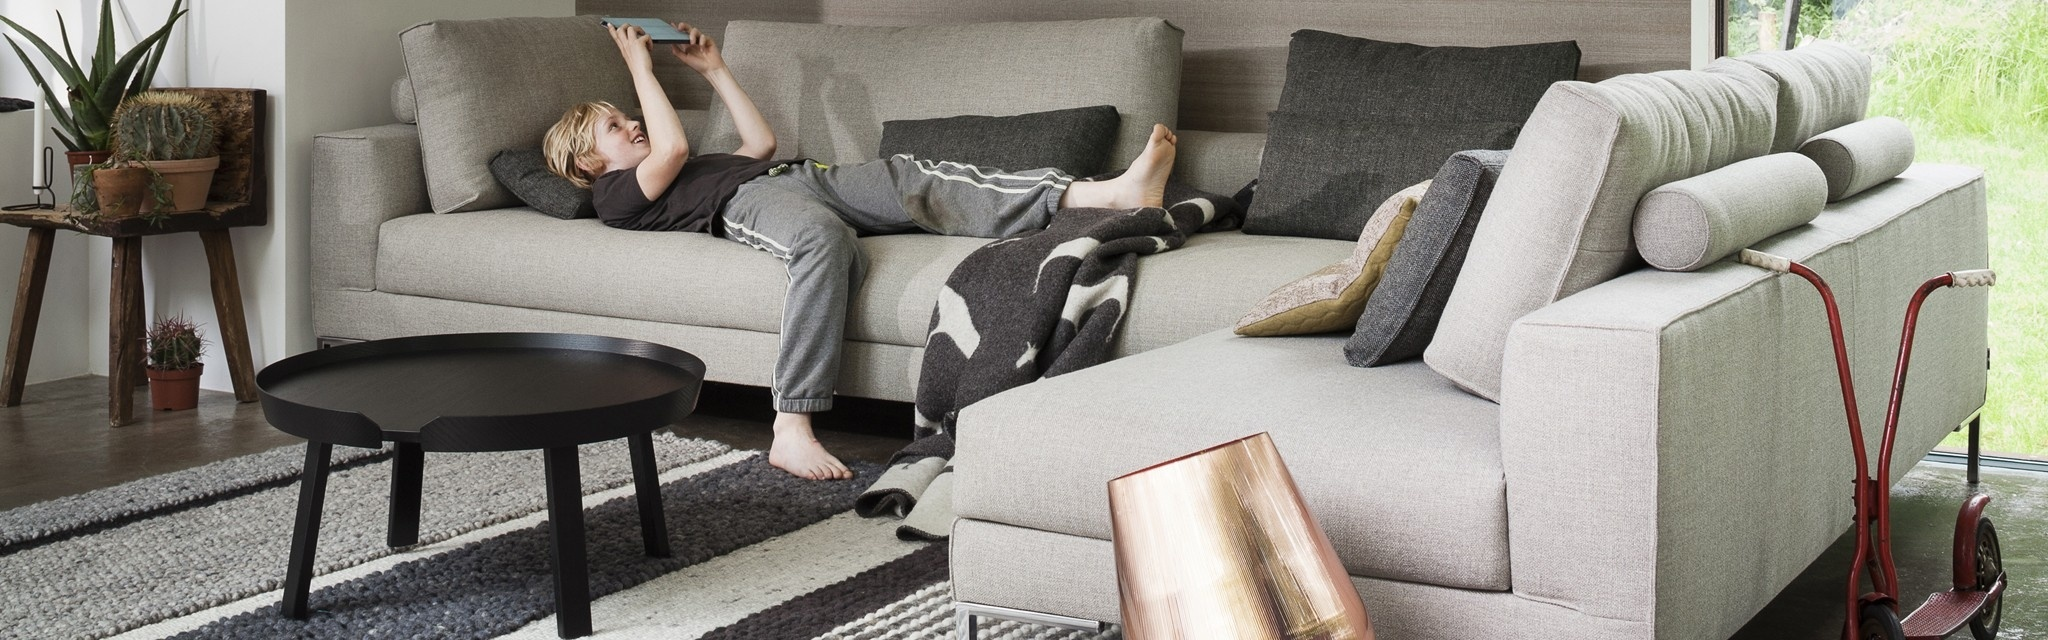 Our Dutch Modern Furniture